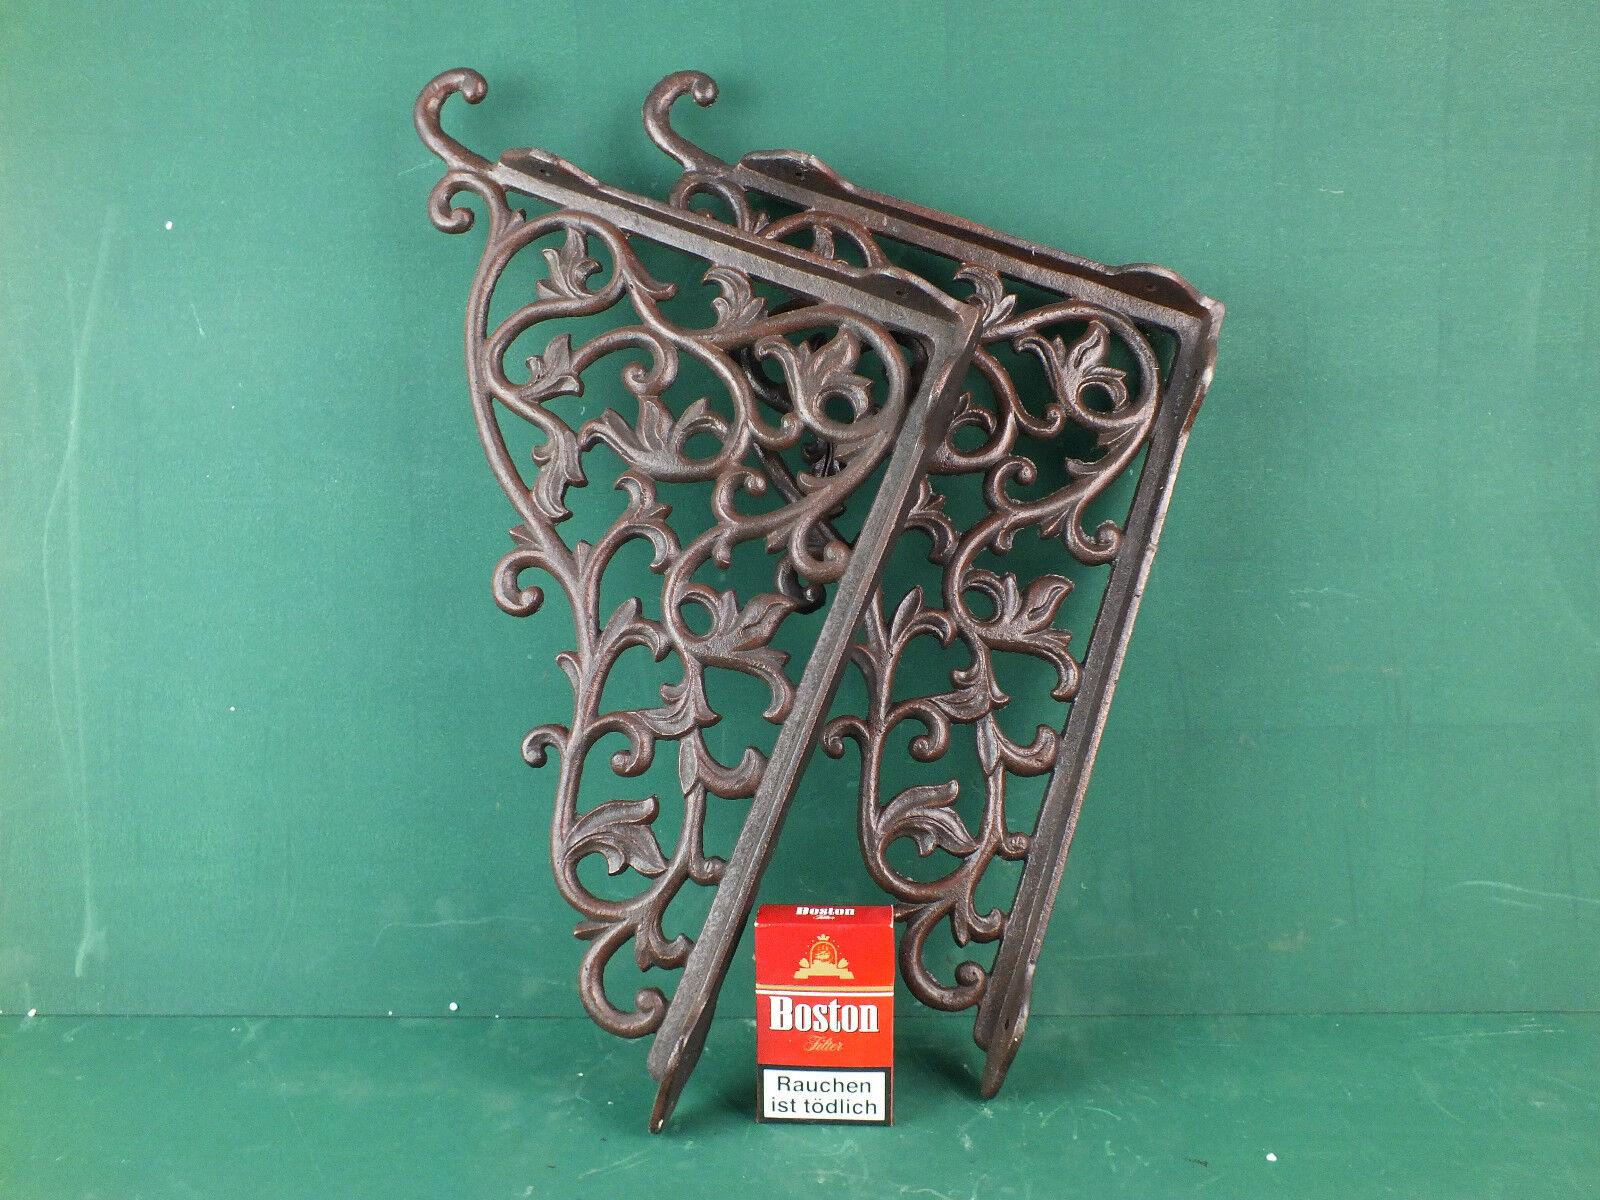 1 Paar Regalwinkel Regalstützen sehr große Jugendstil verzierte Eisen Wandwinkel